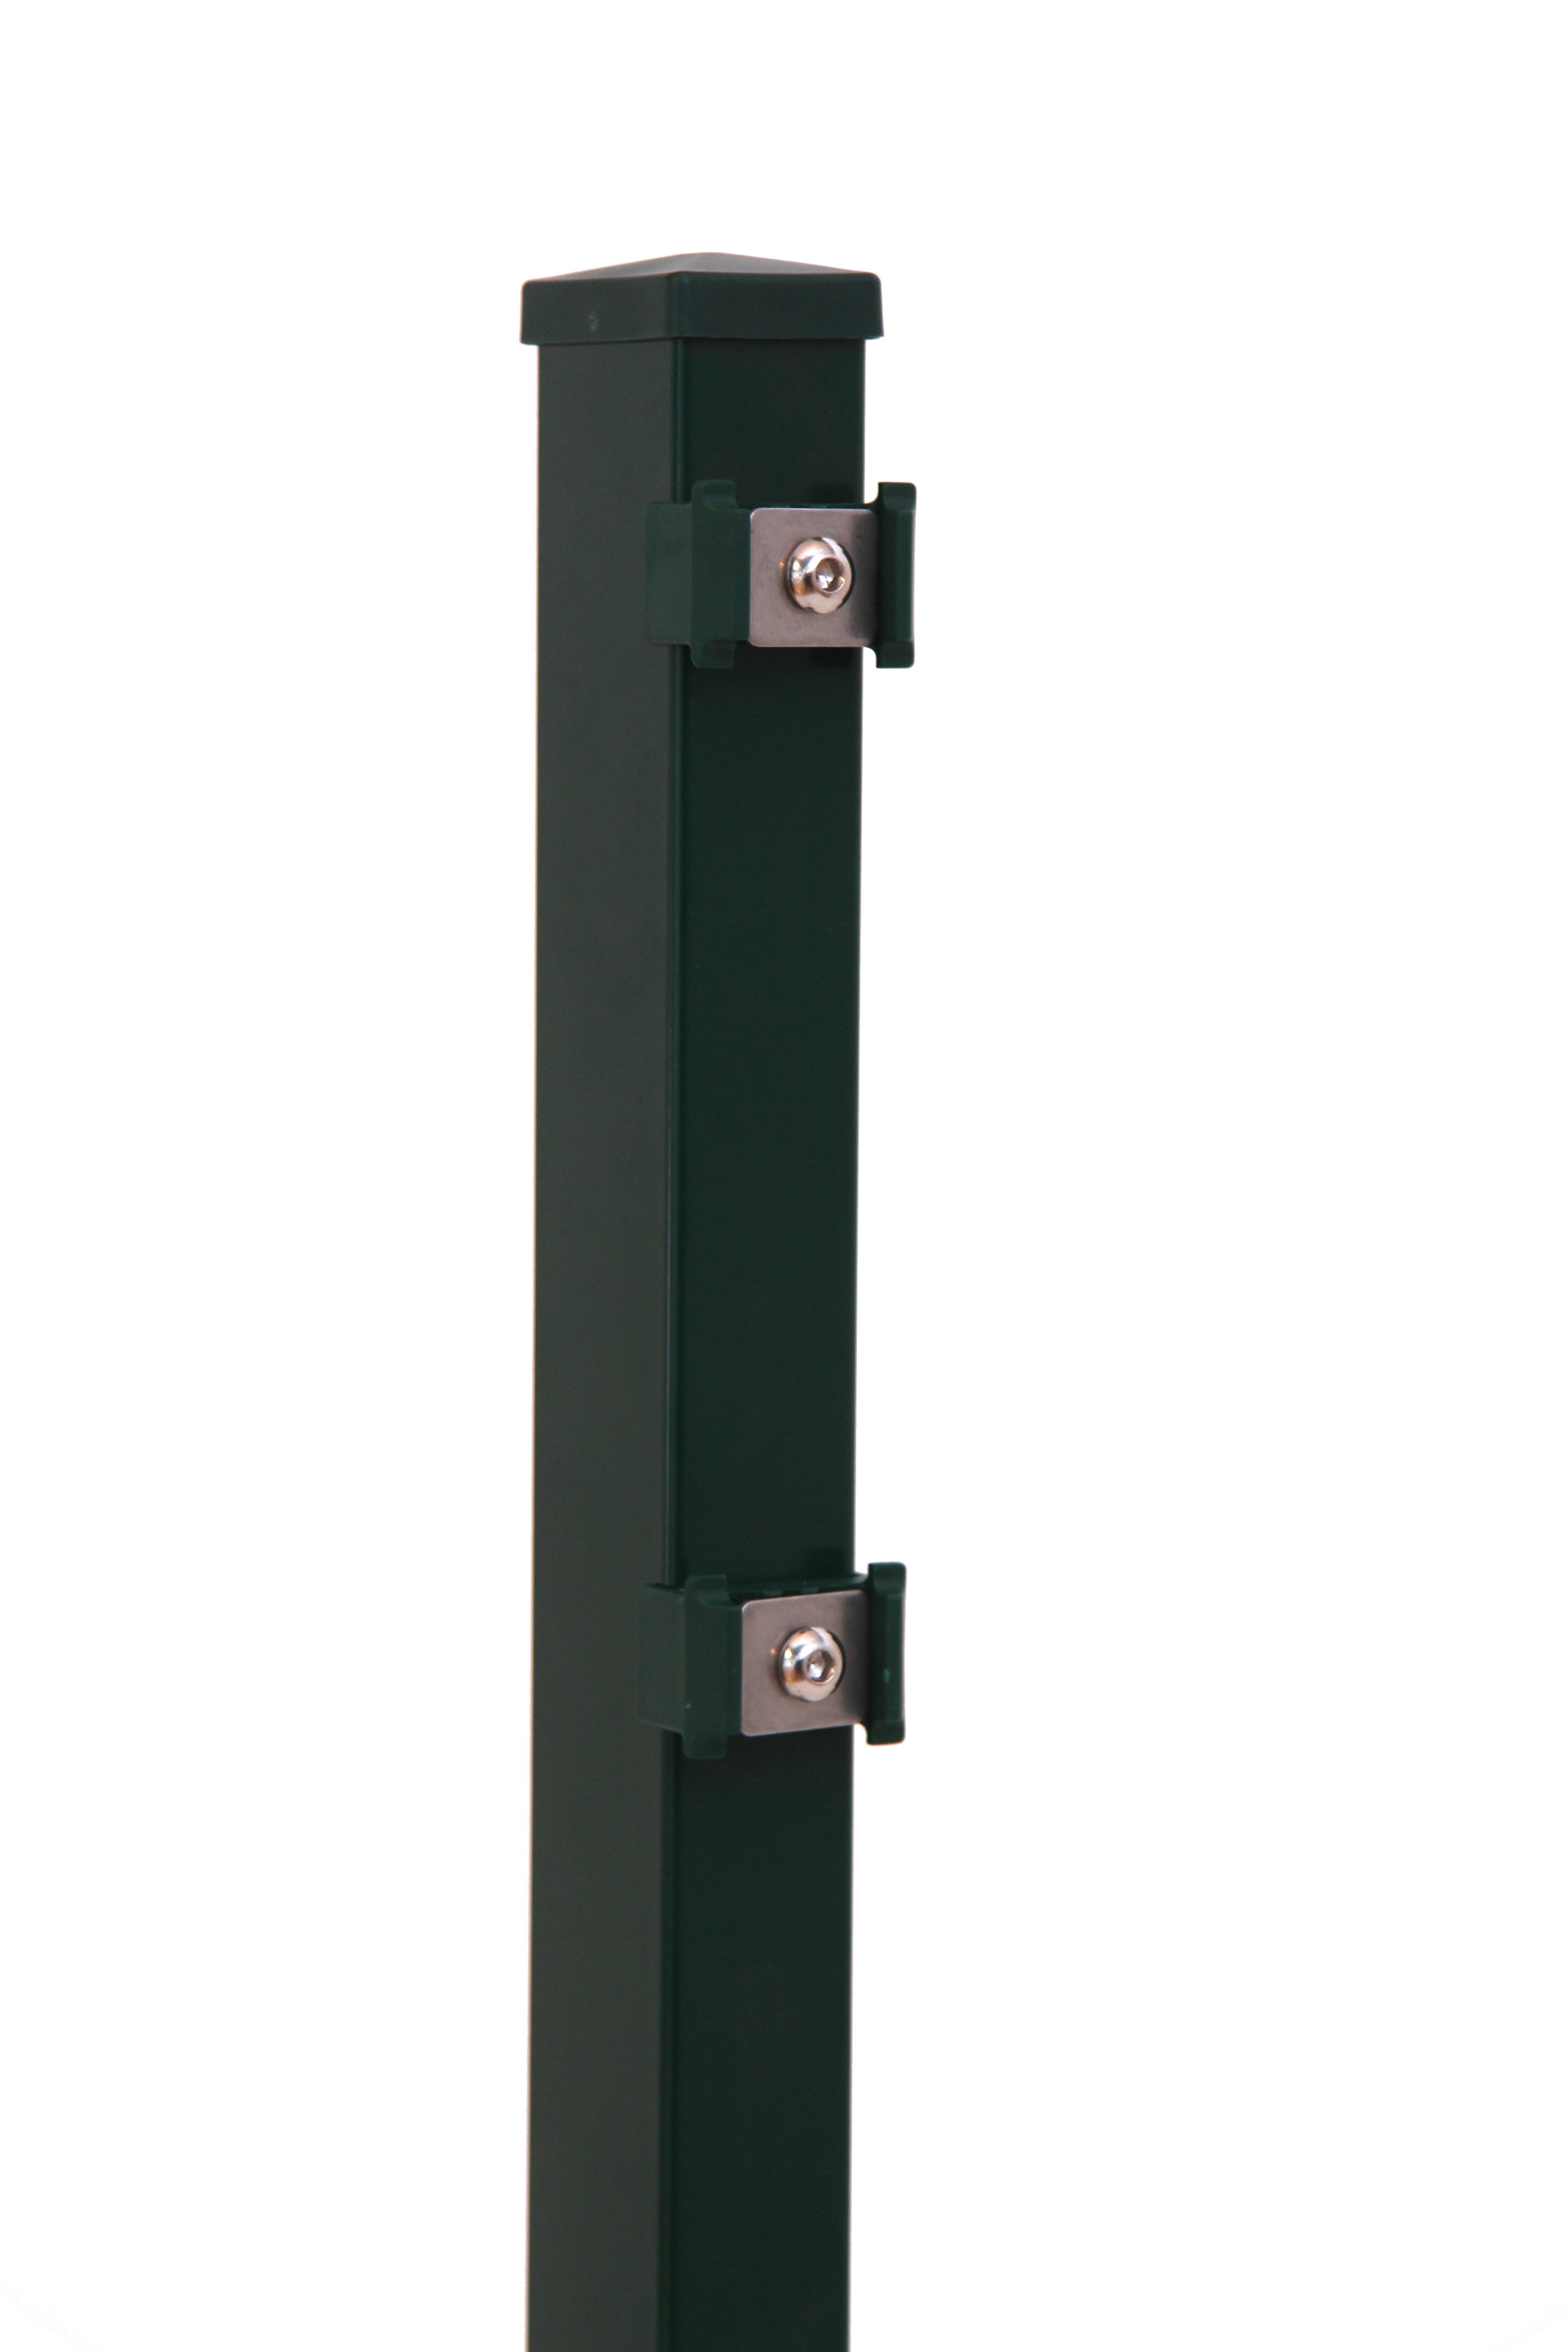 Stalen paal 4 x 4 cm Type Groen